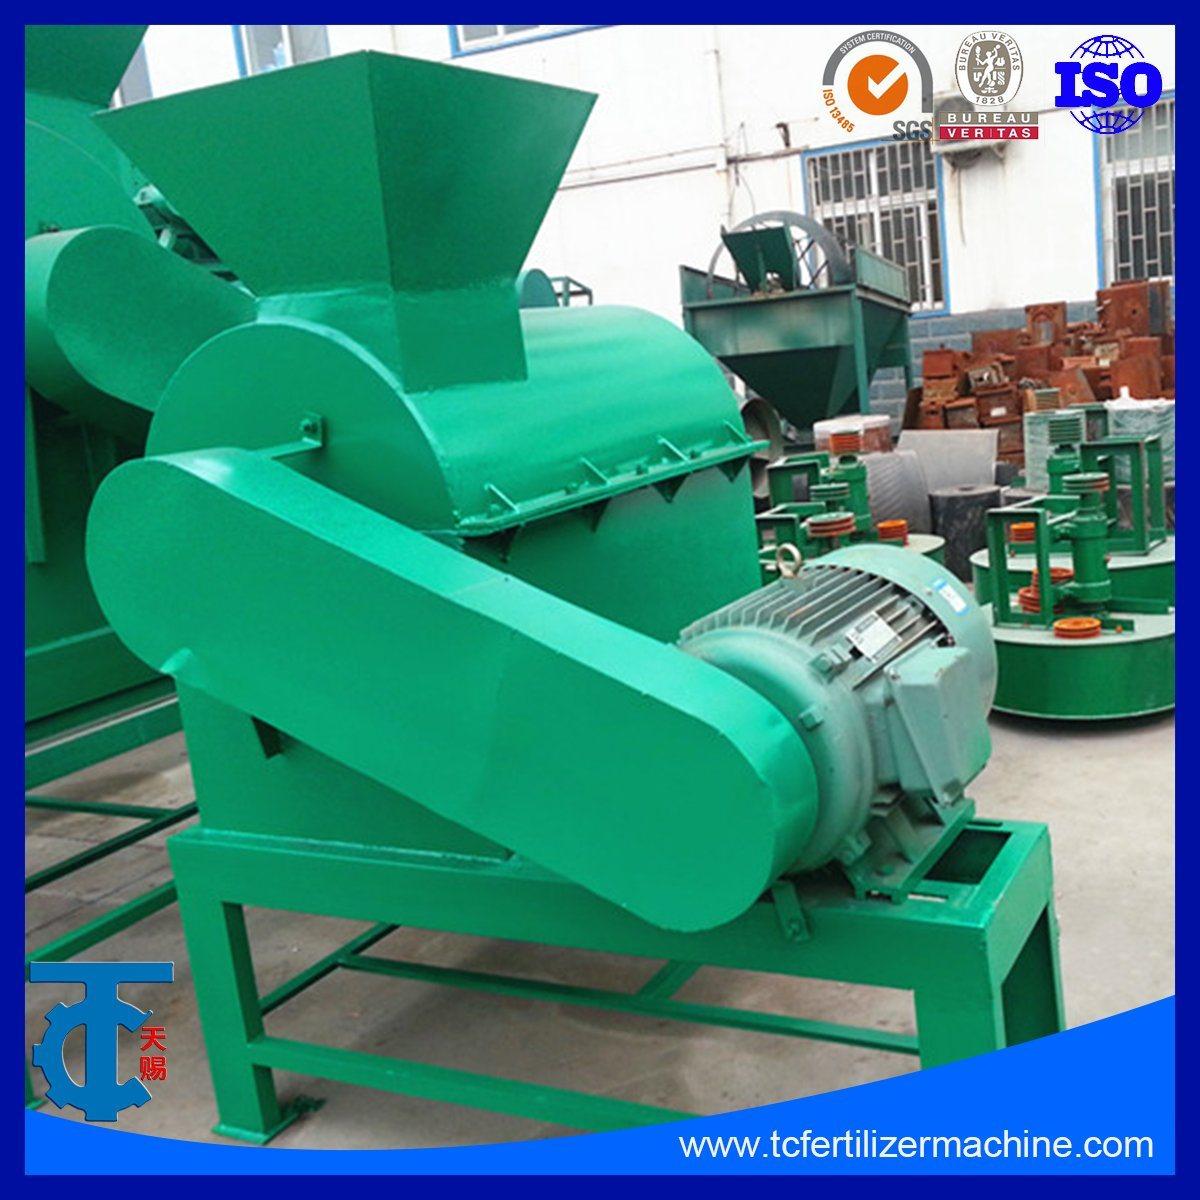 China Animal Waste Compost Crushing Machine for Organic Fertilizer  Production - China Livestock Manure Crusher, Organic Fertilizer Crushing  Process